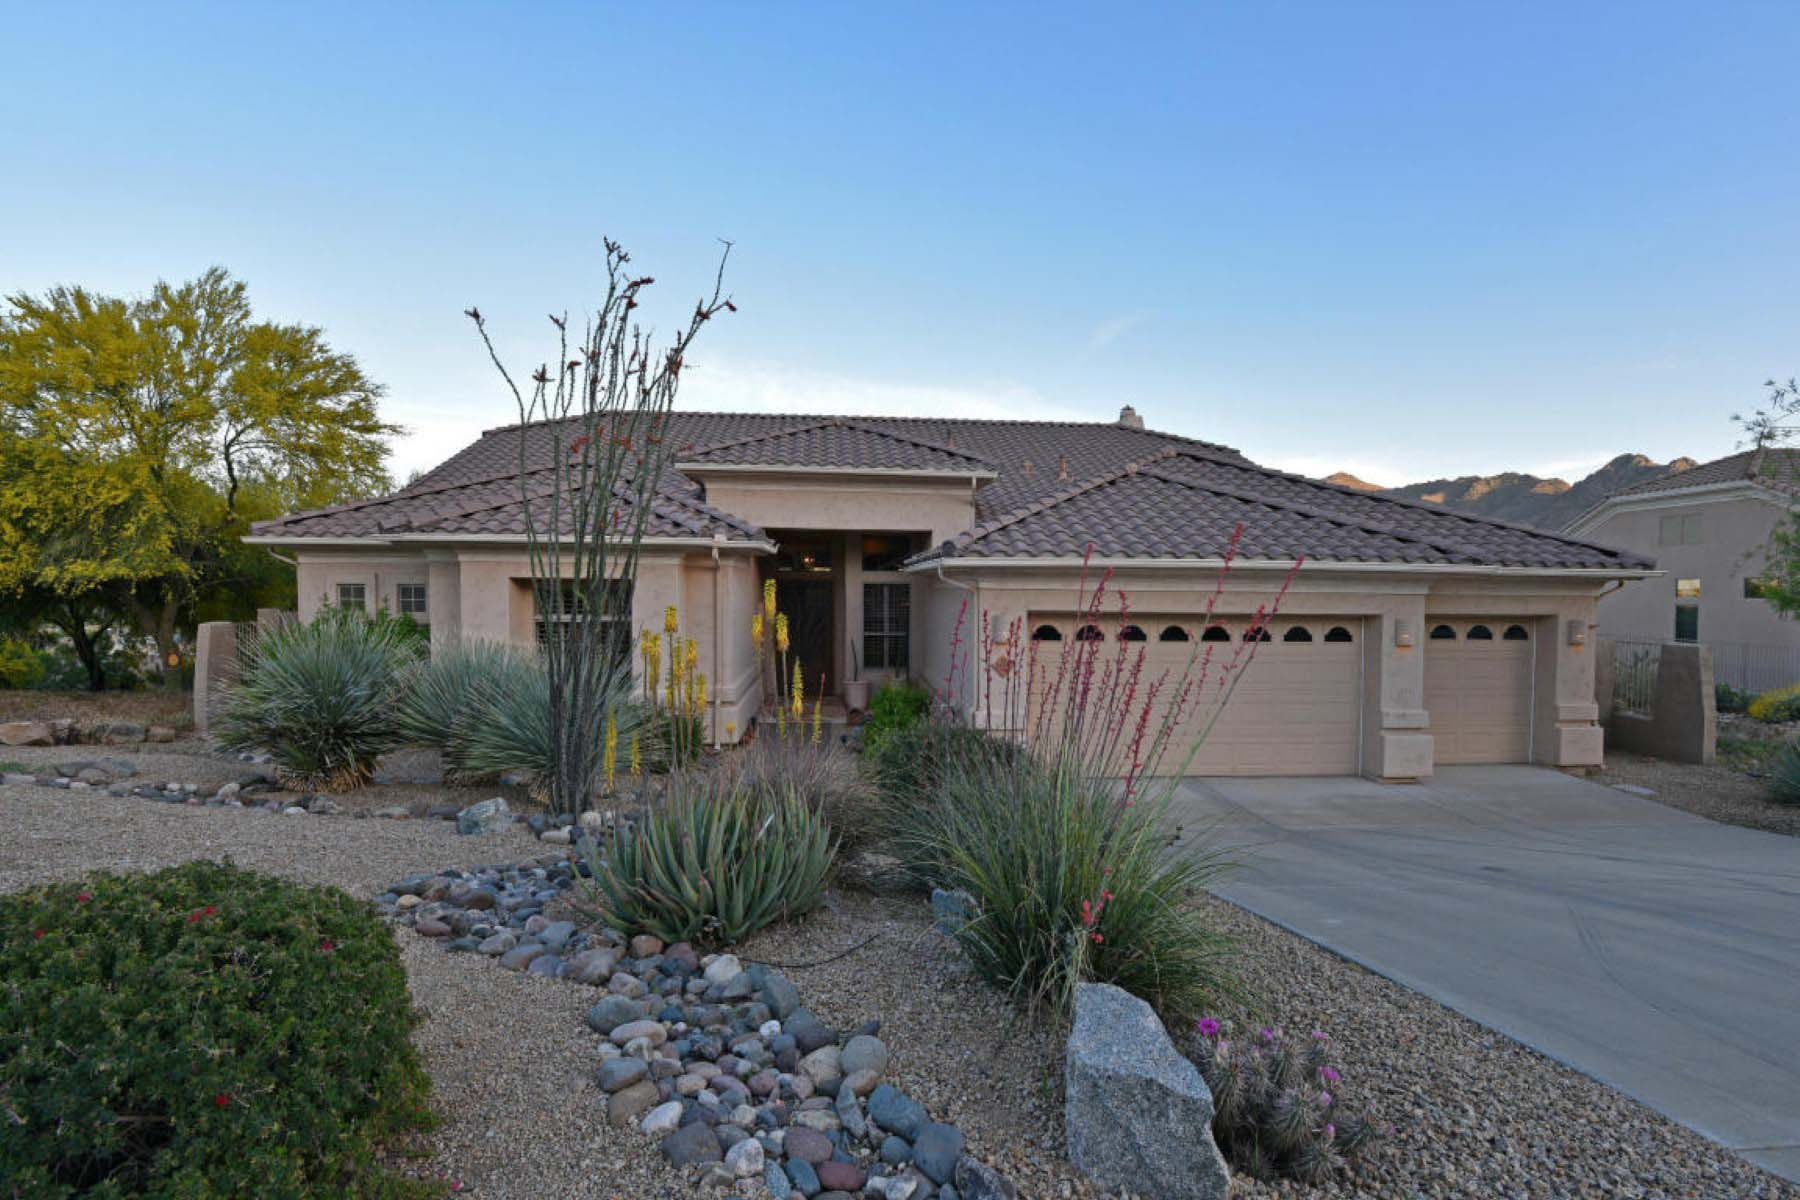 Vivienda unifamiliar por un Venta en Comfortable living in this well maintained home; surrounded by mountain views. 11573 E BUCKSKIN TRL Scottsdale, Arizona 85255 Estados Unidos